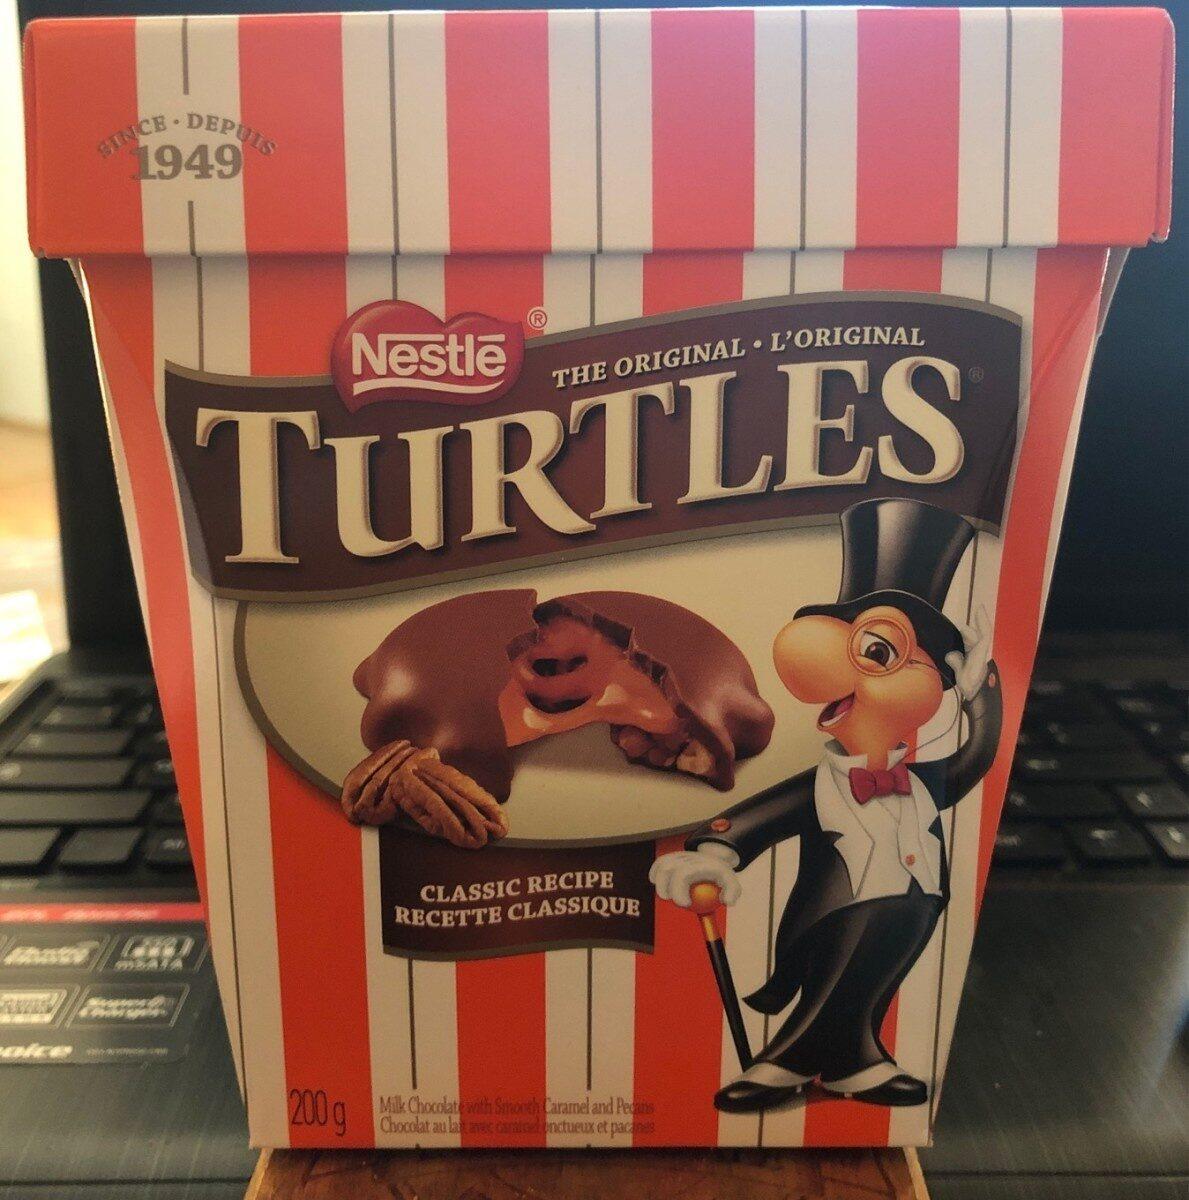 Turtles Original - Produit - en